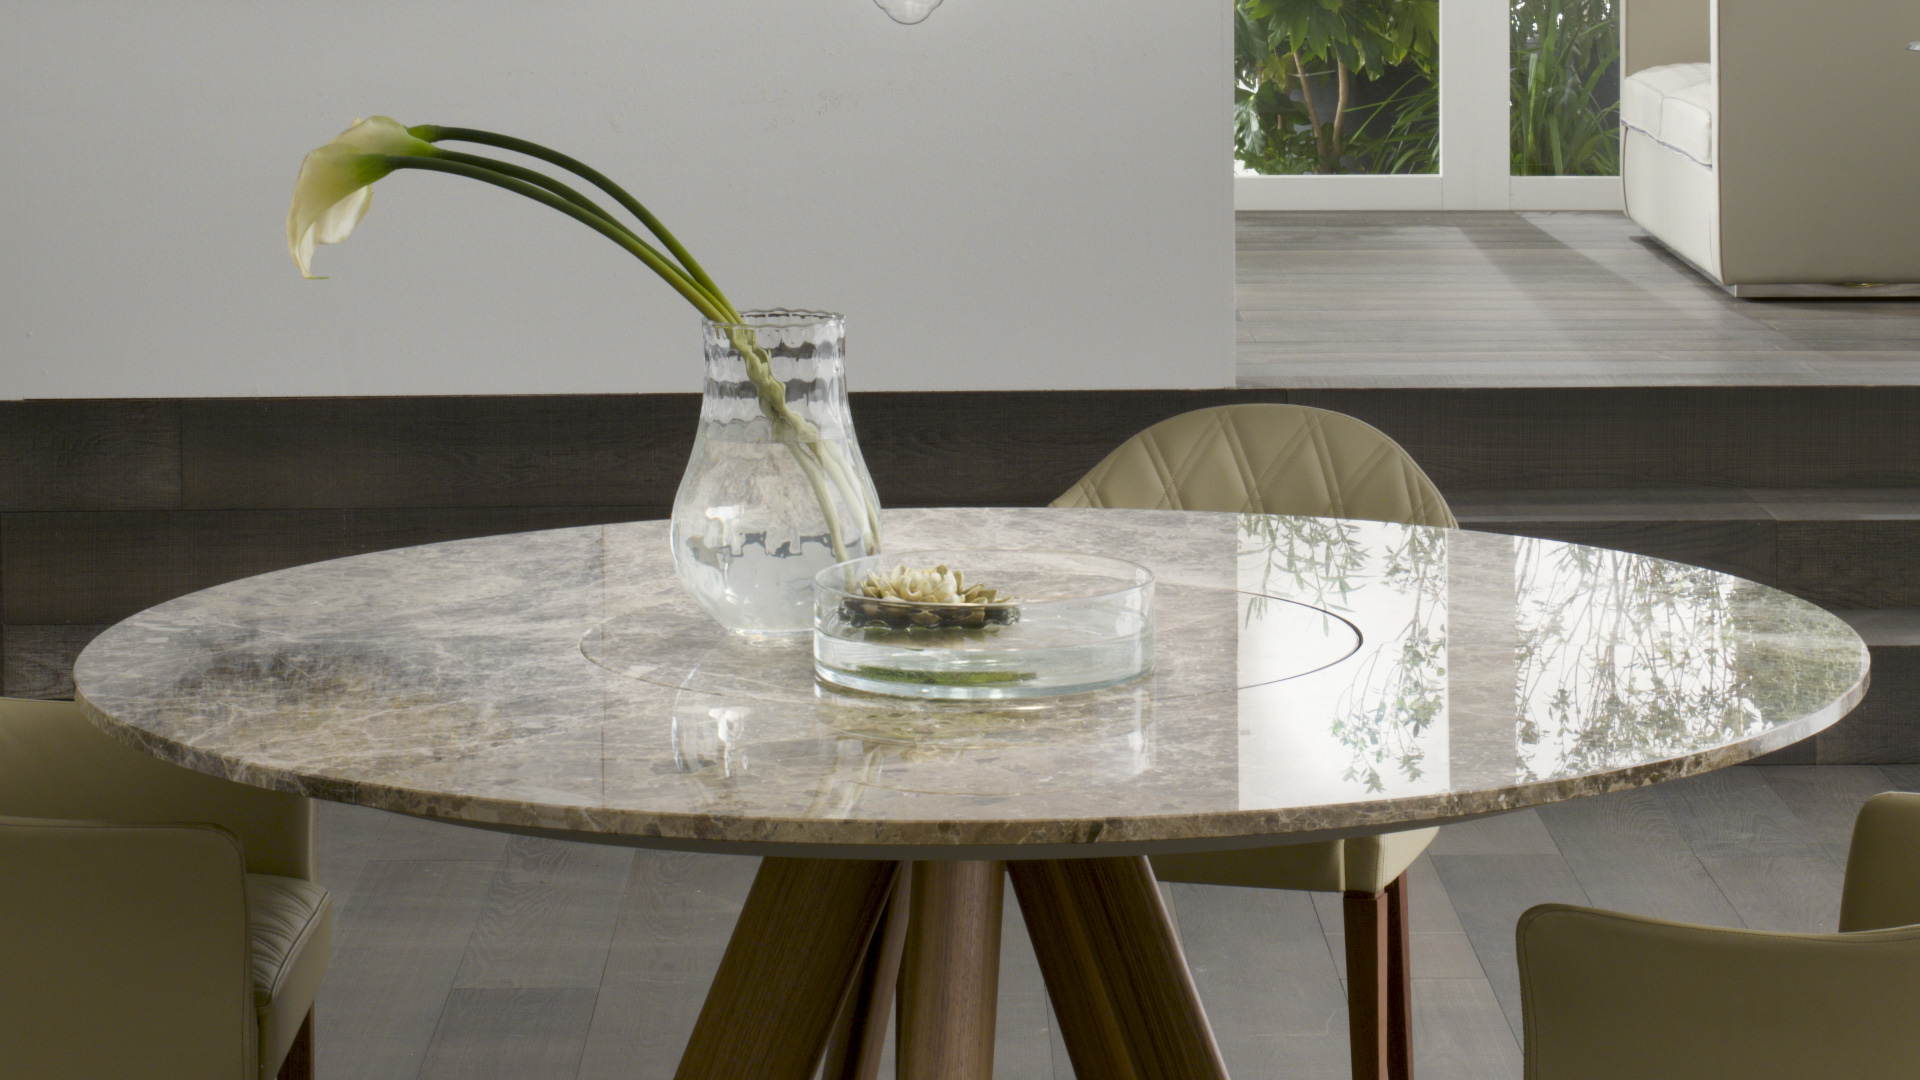 lem with lazy susan table